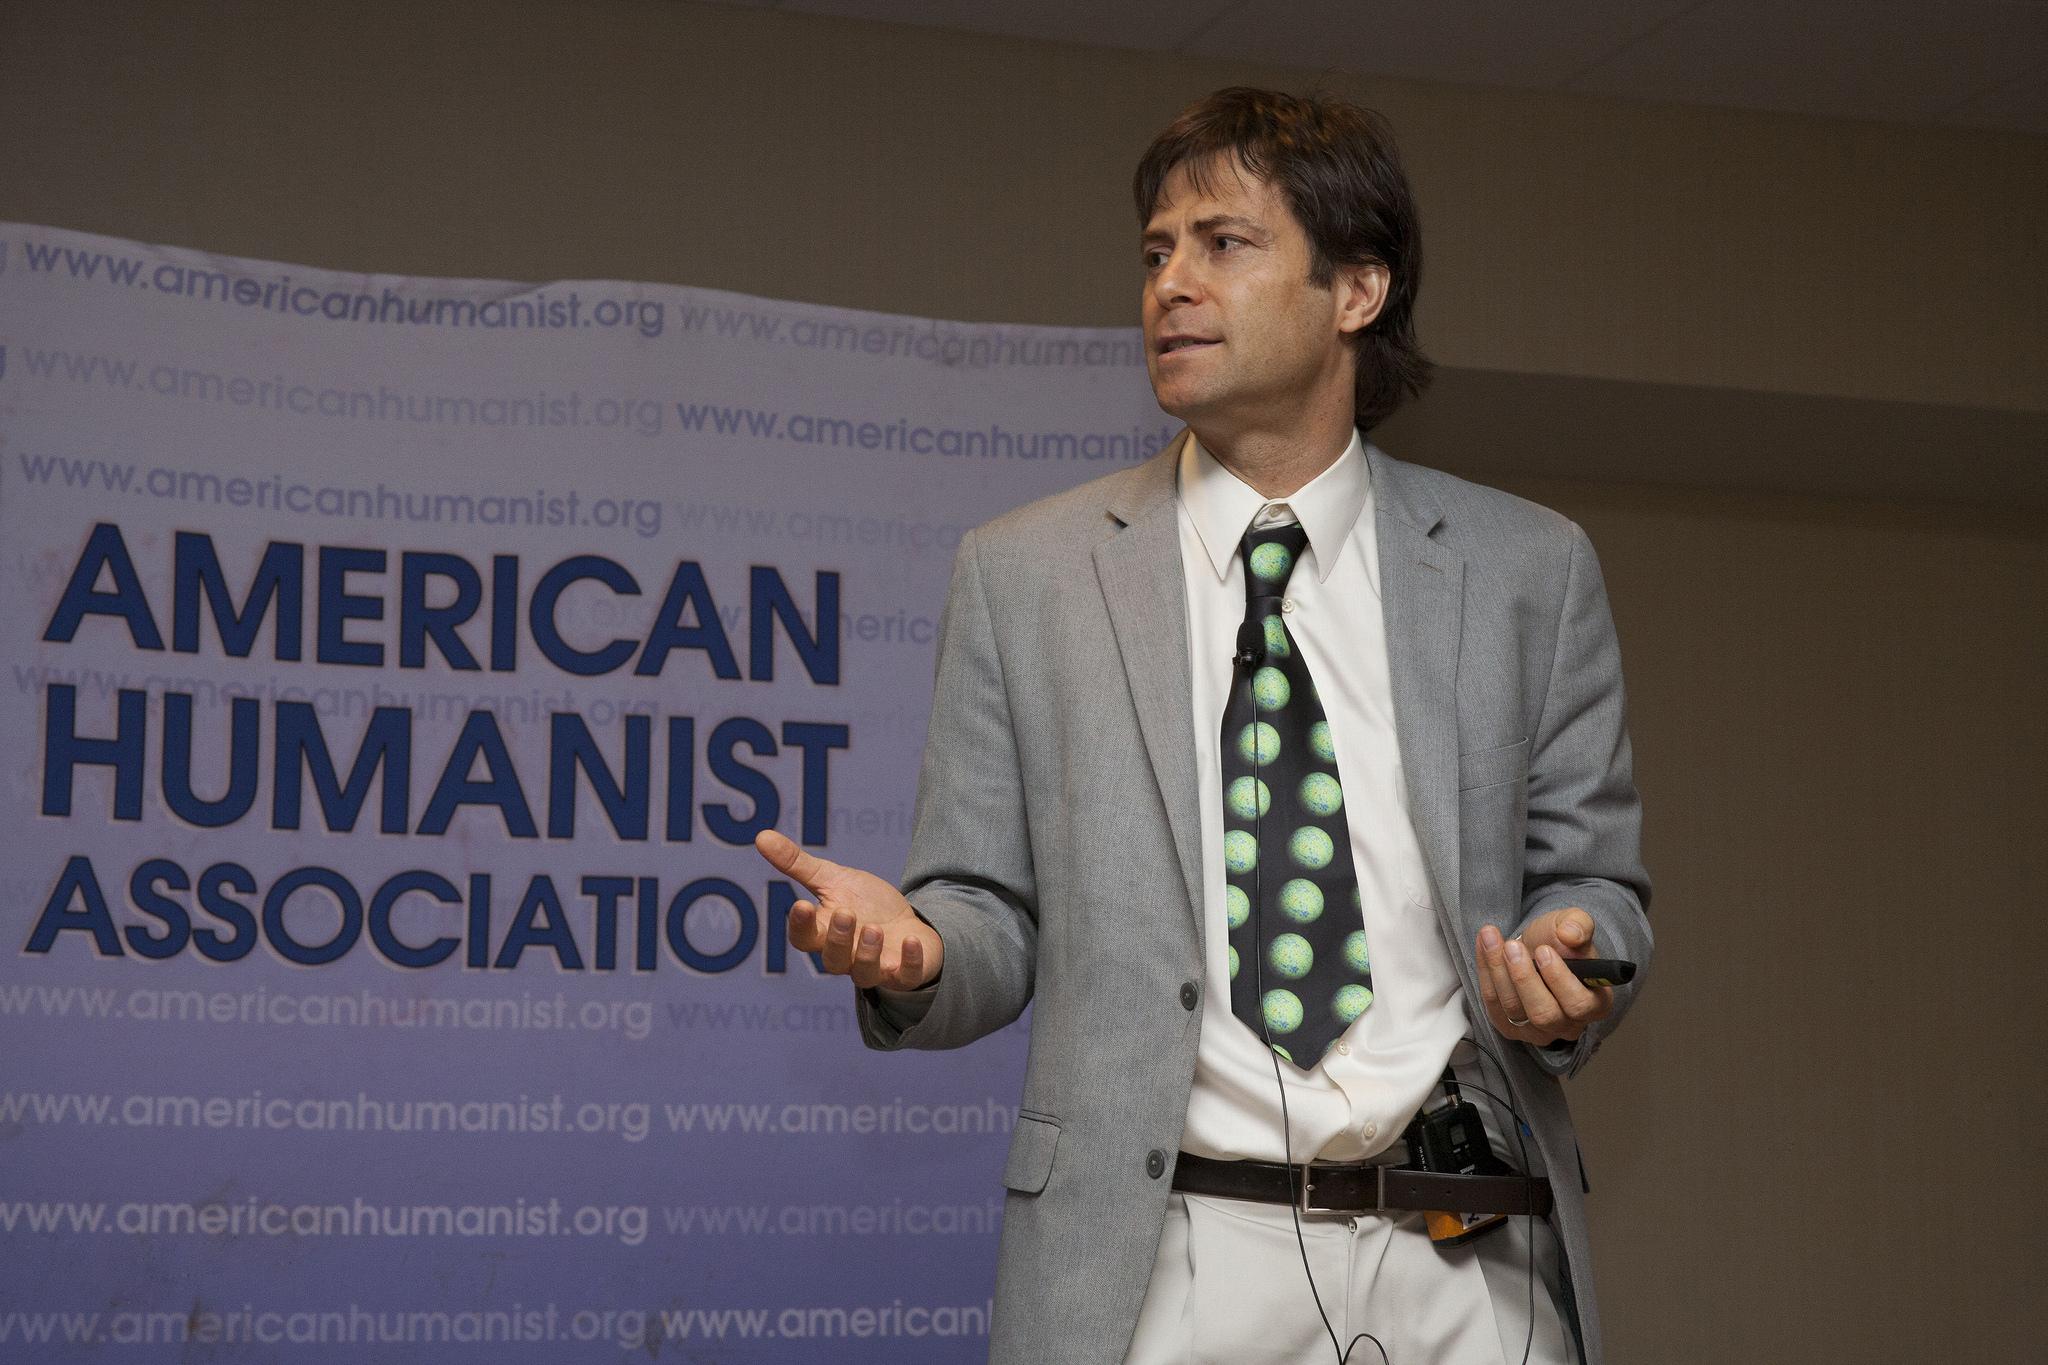 Max Tegmark, Keynote Speaker